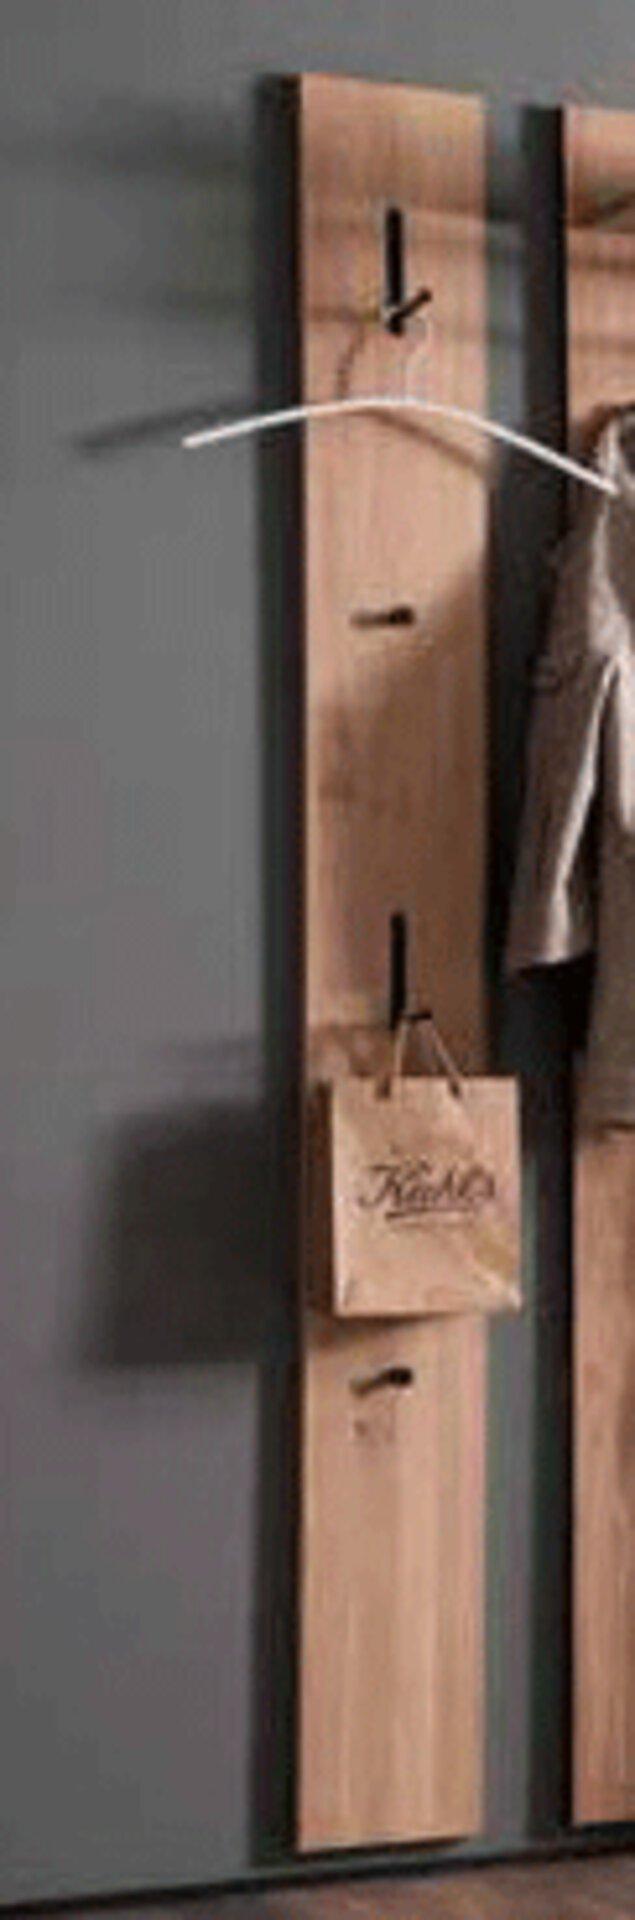 Garderobenpaneel NOVARA Wittenbreder Holz mehrfarbig 37 x 196 x 61 cm